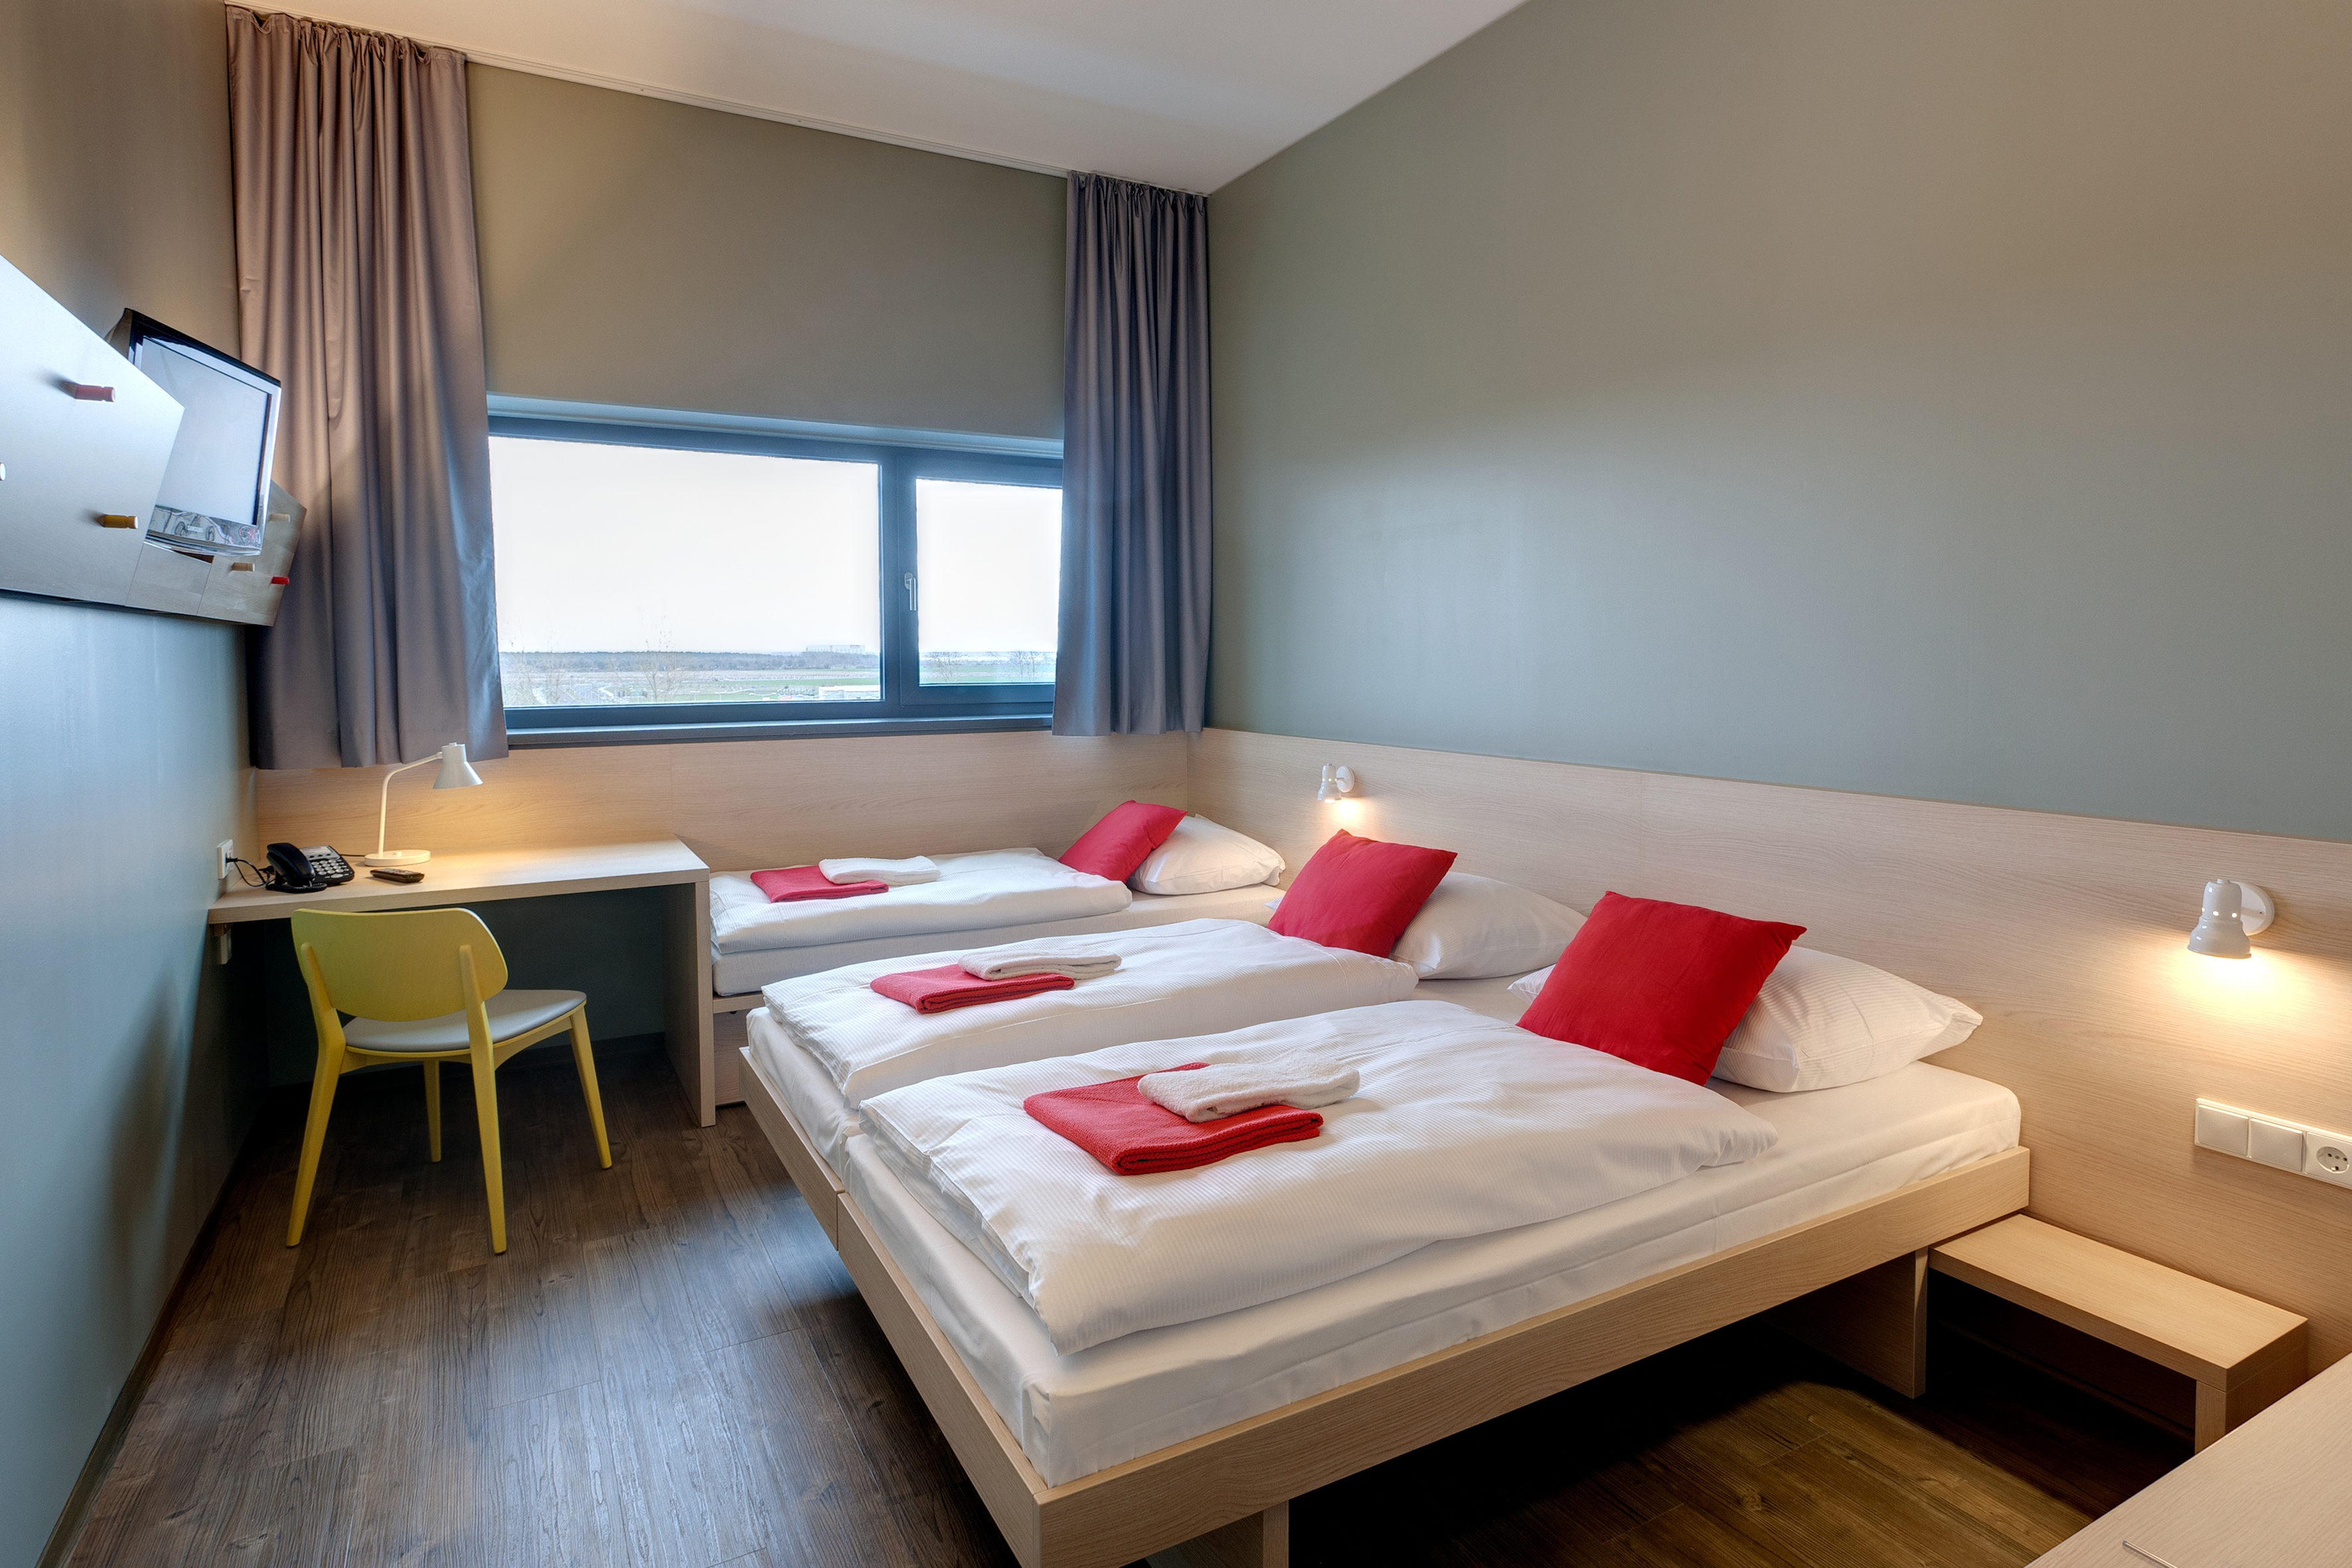 MEININGER Hotel Berlin Airport - Multi-bed